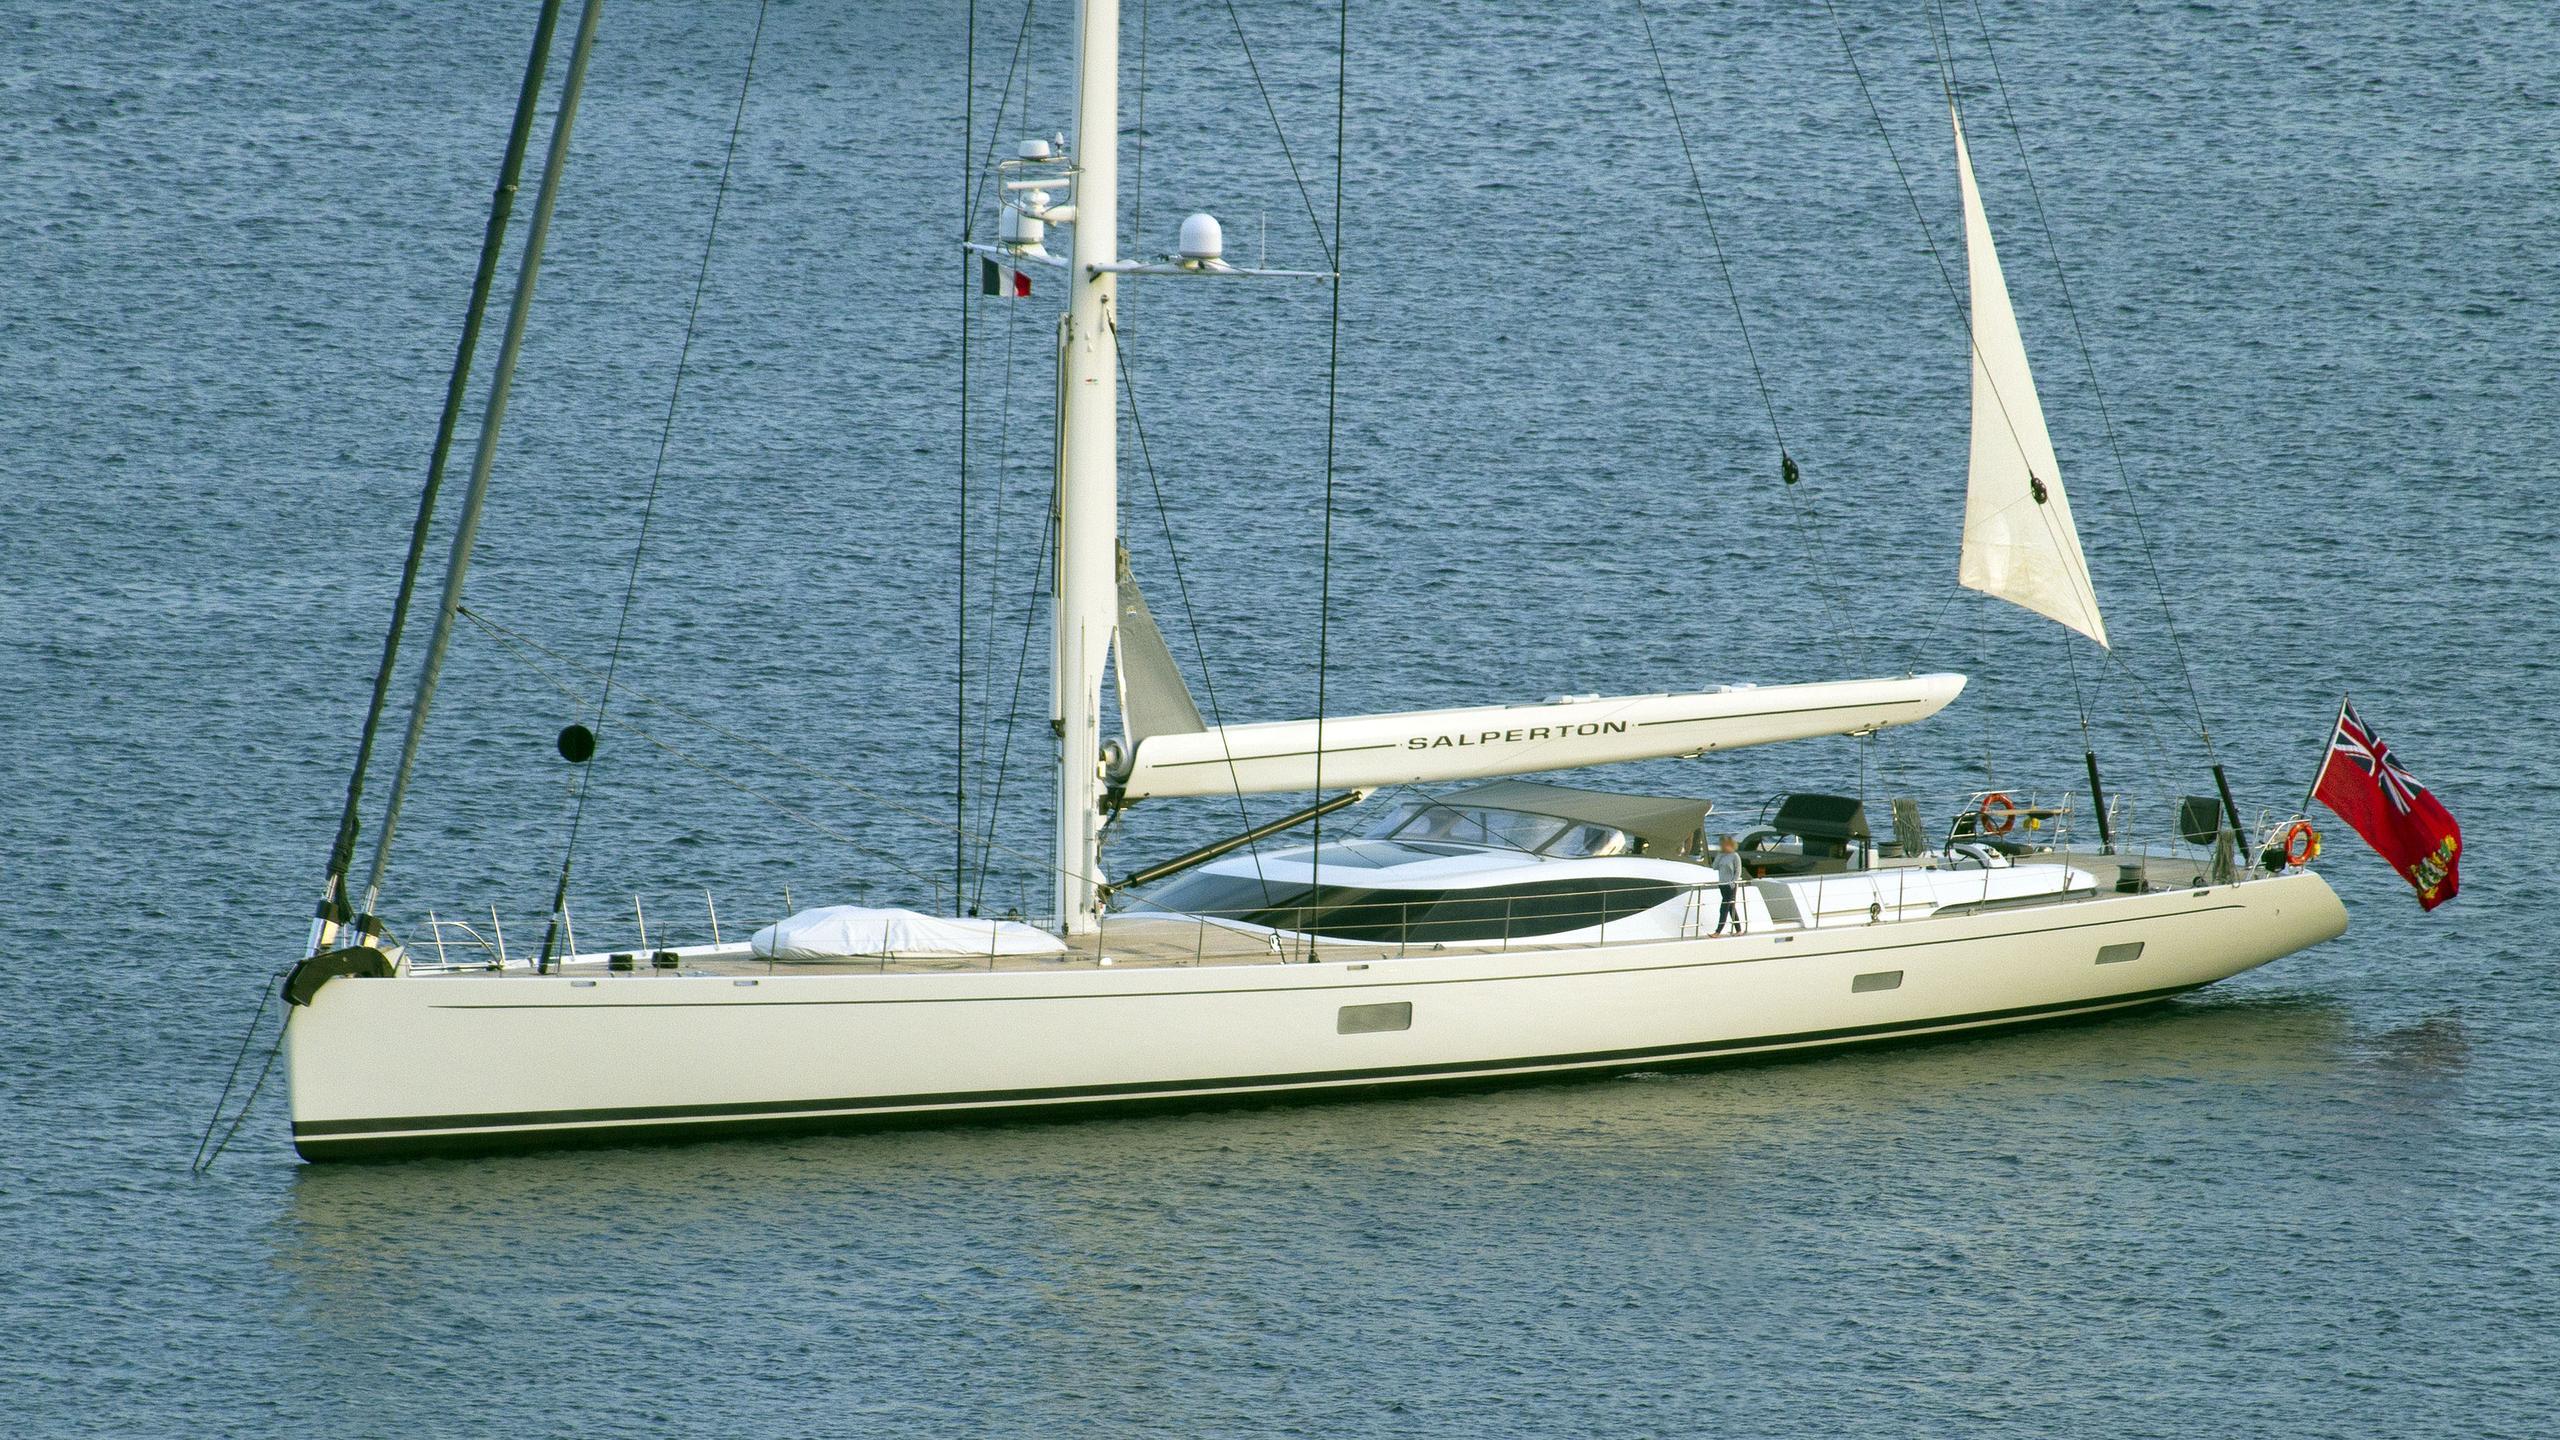 palmira-salperton-sailing-yacht-fitzroy-2009-45m-half-profile